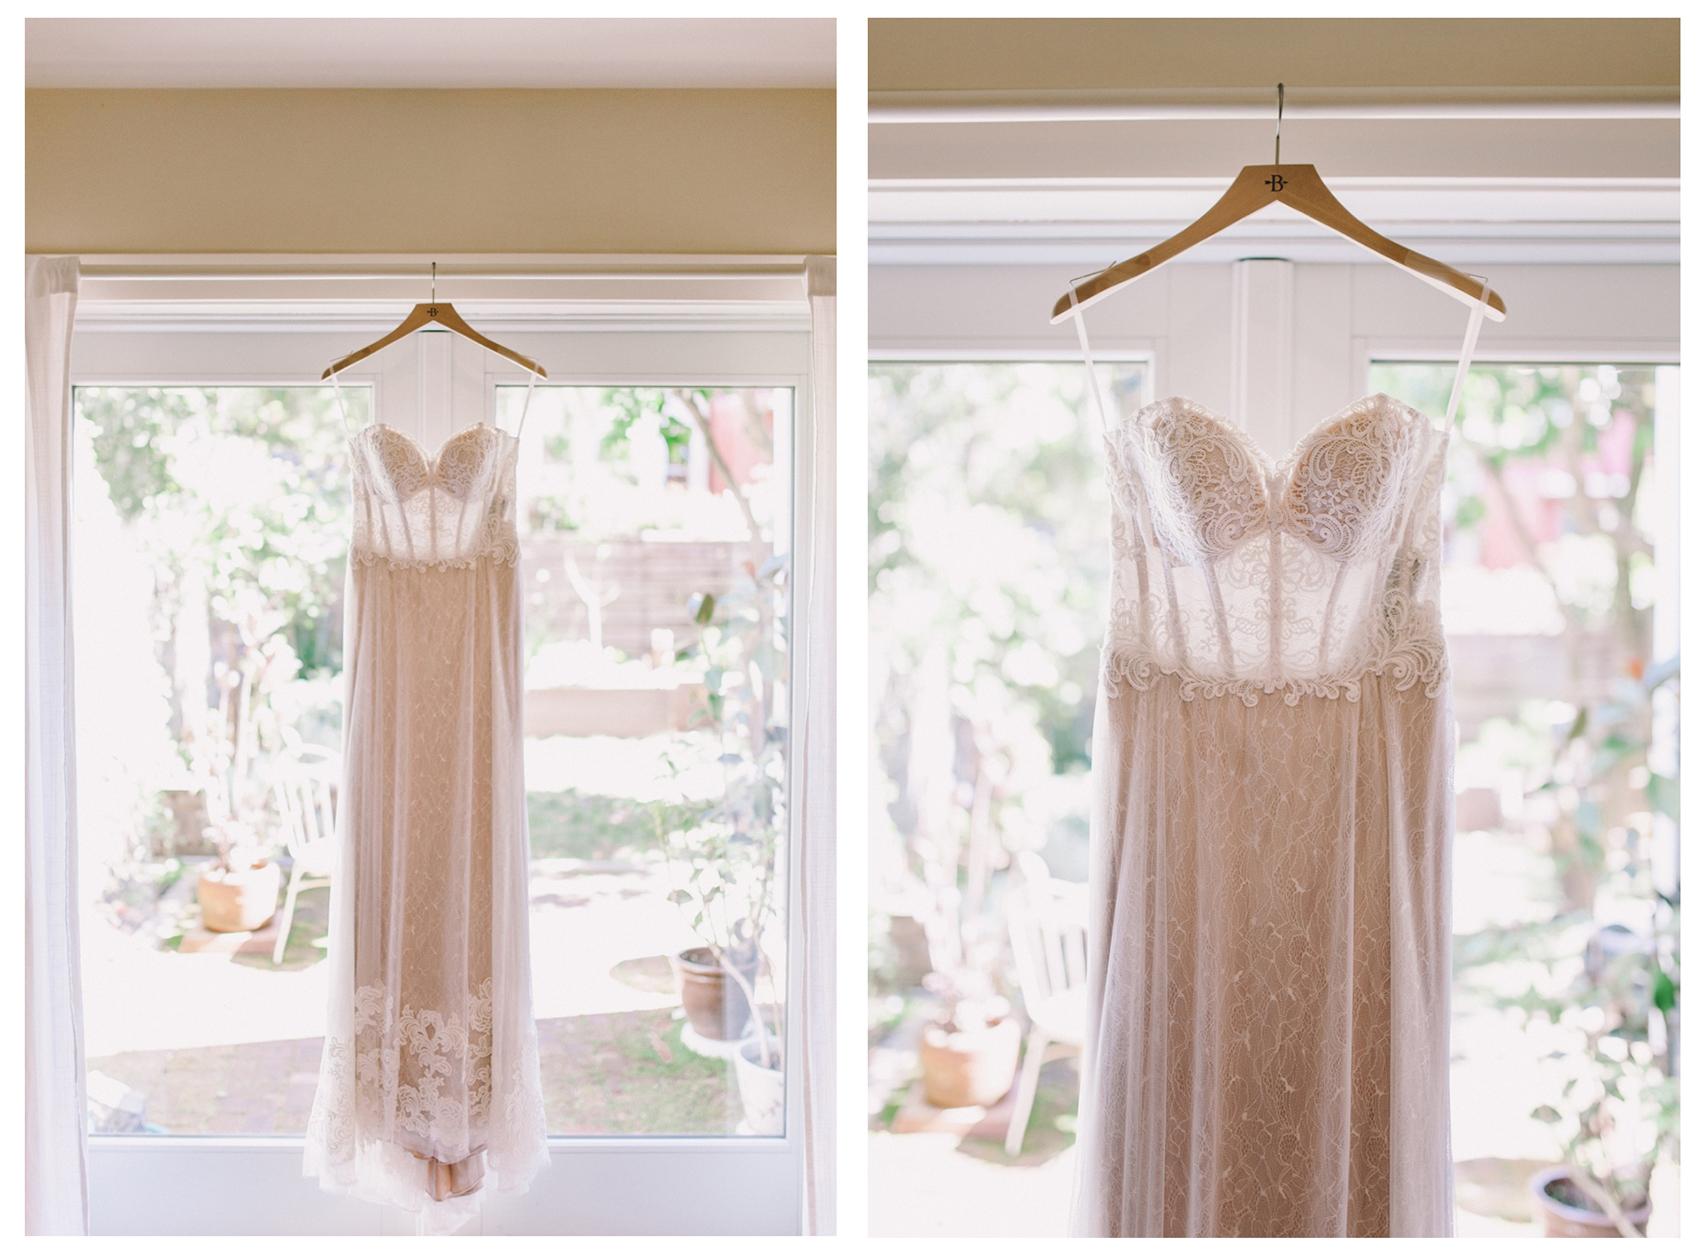 Anthropologie BHLDN Lorena Gown Wedding Dress Hanging in Front of Window